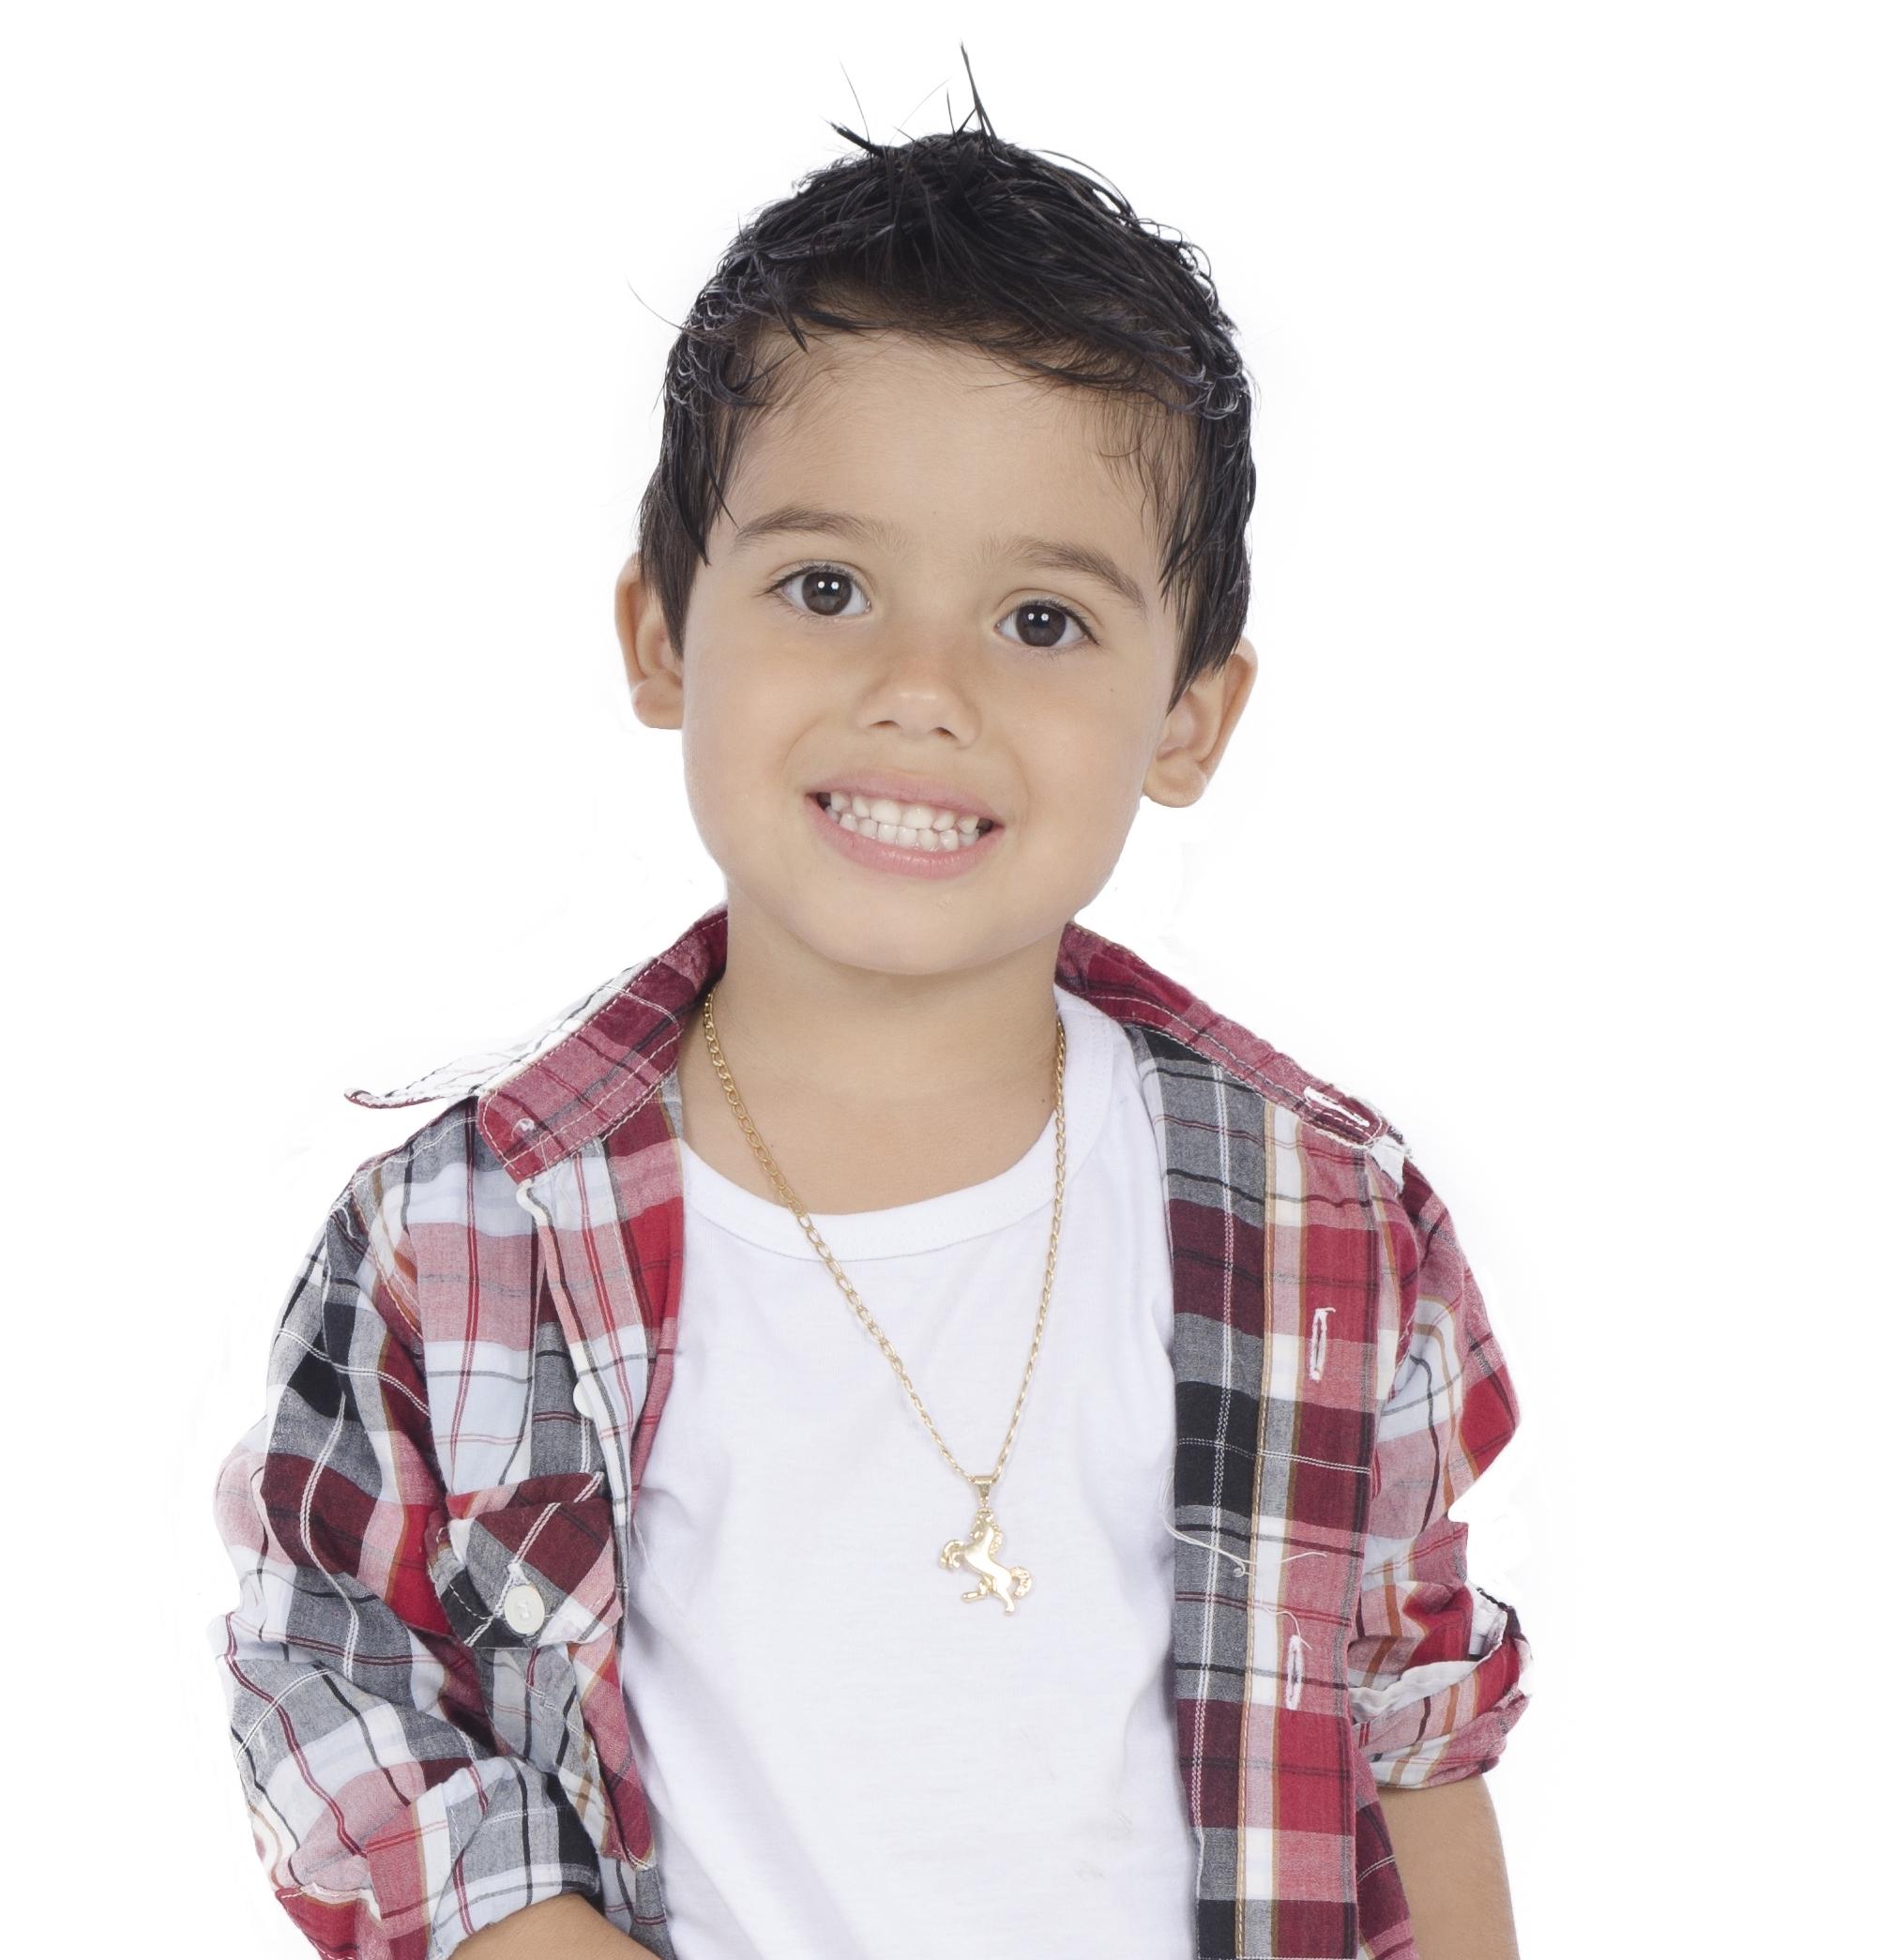 Joaquim Neves